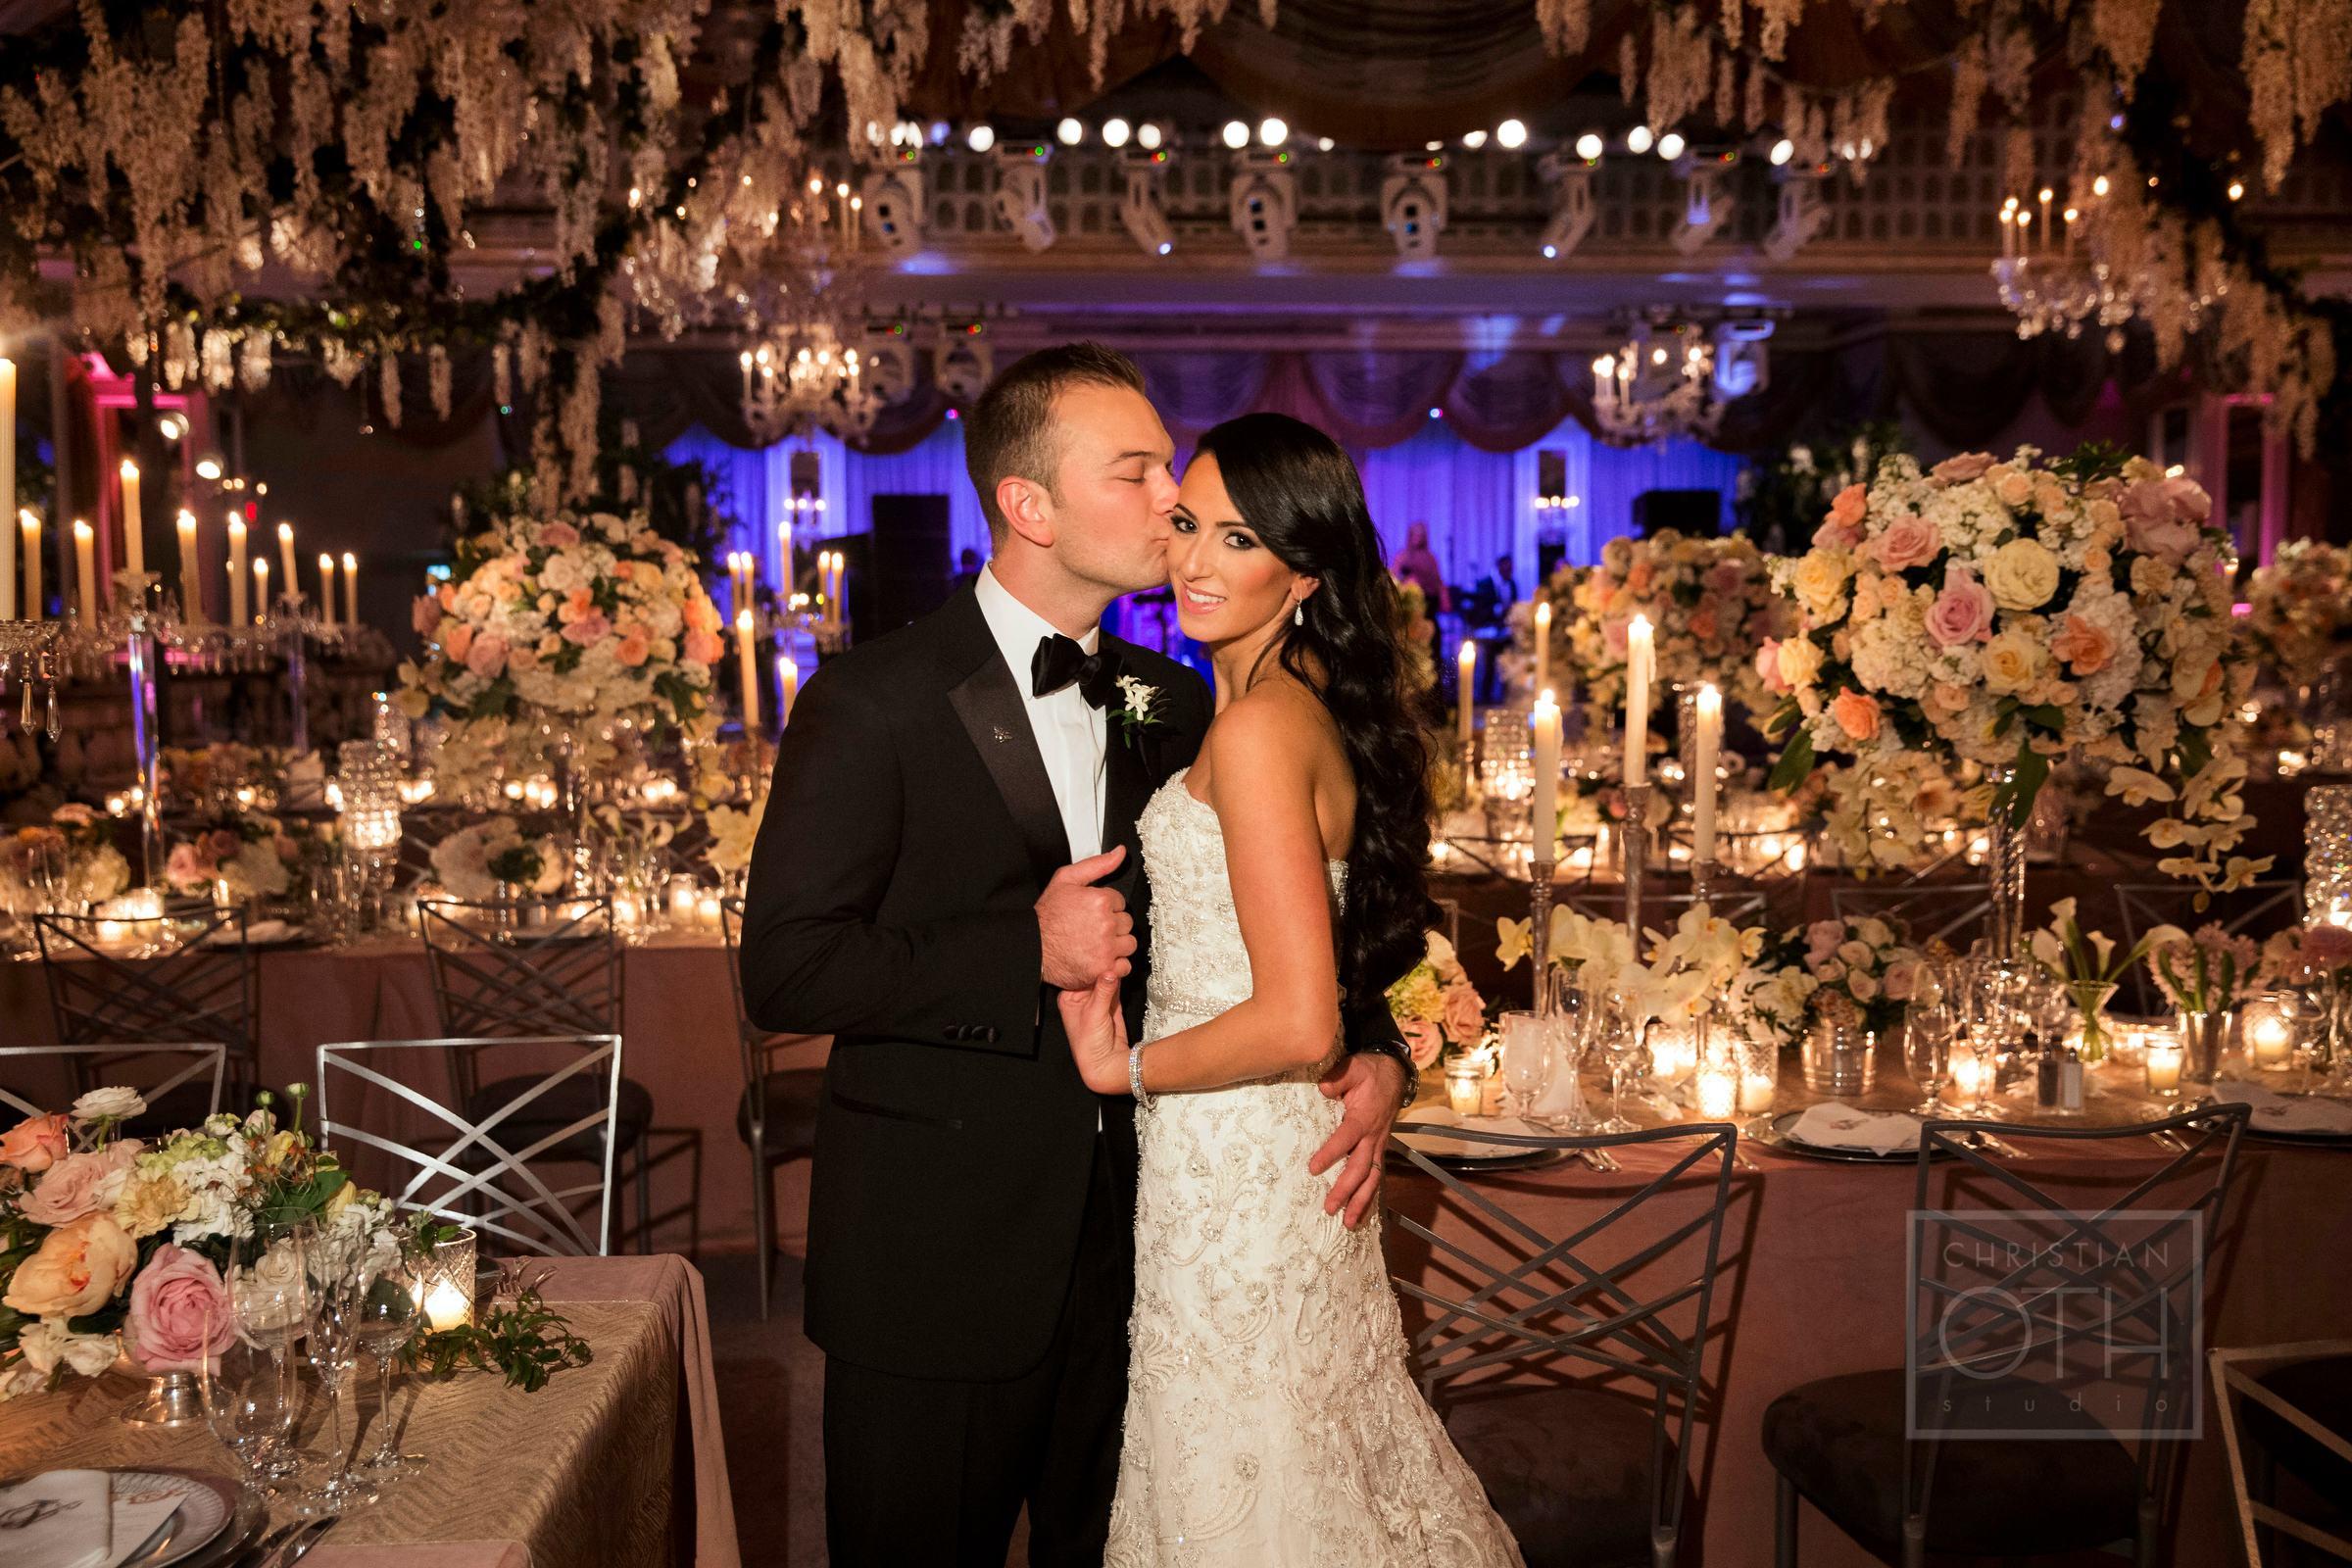 Ceci_New_York_Custom_Invitation_Pierre__City_ Destination_Wedding_Luxury_Personalized_Ceci_Style_Bride_Rose_Gold_Foil_Stamping130.JPG